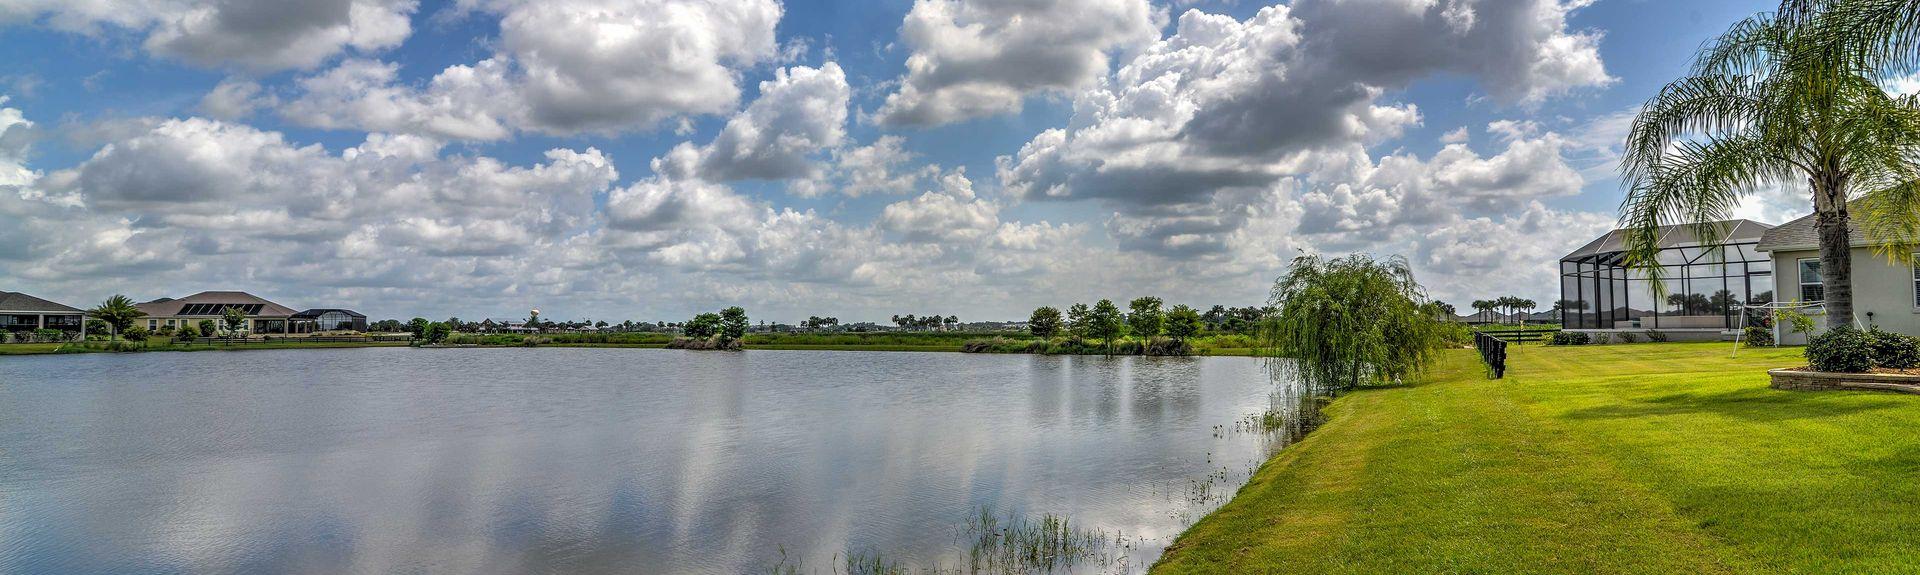 Bushnell, Florida, Verenigde Staten